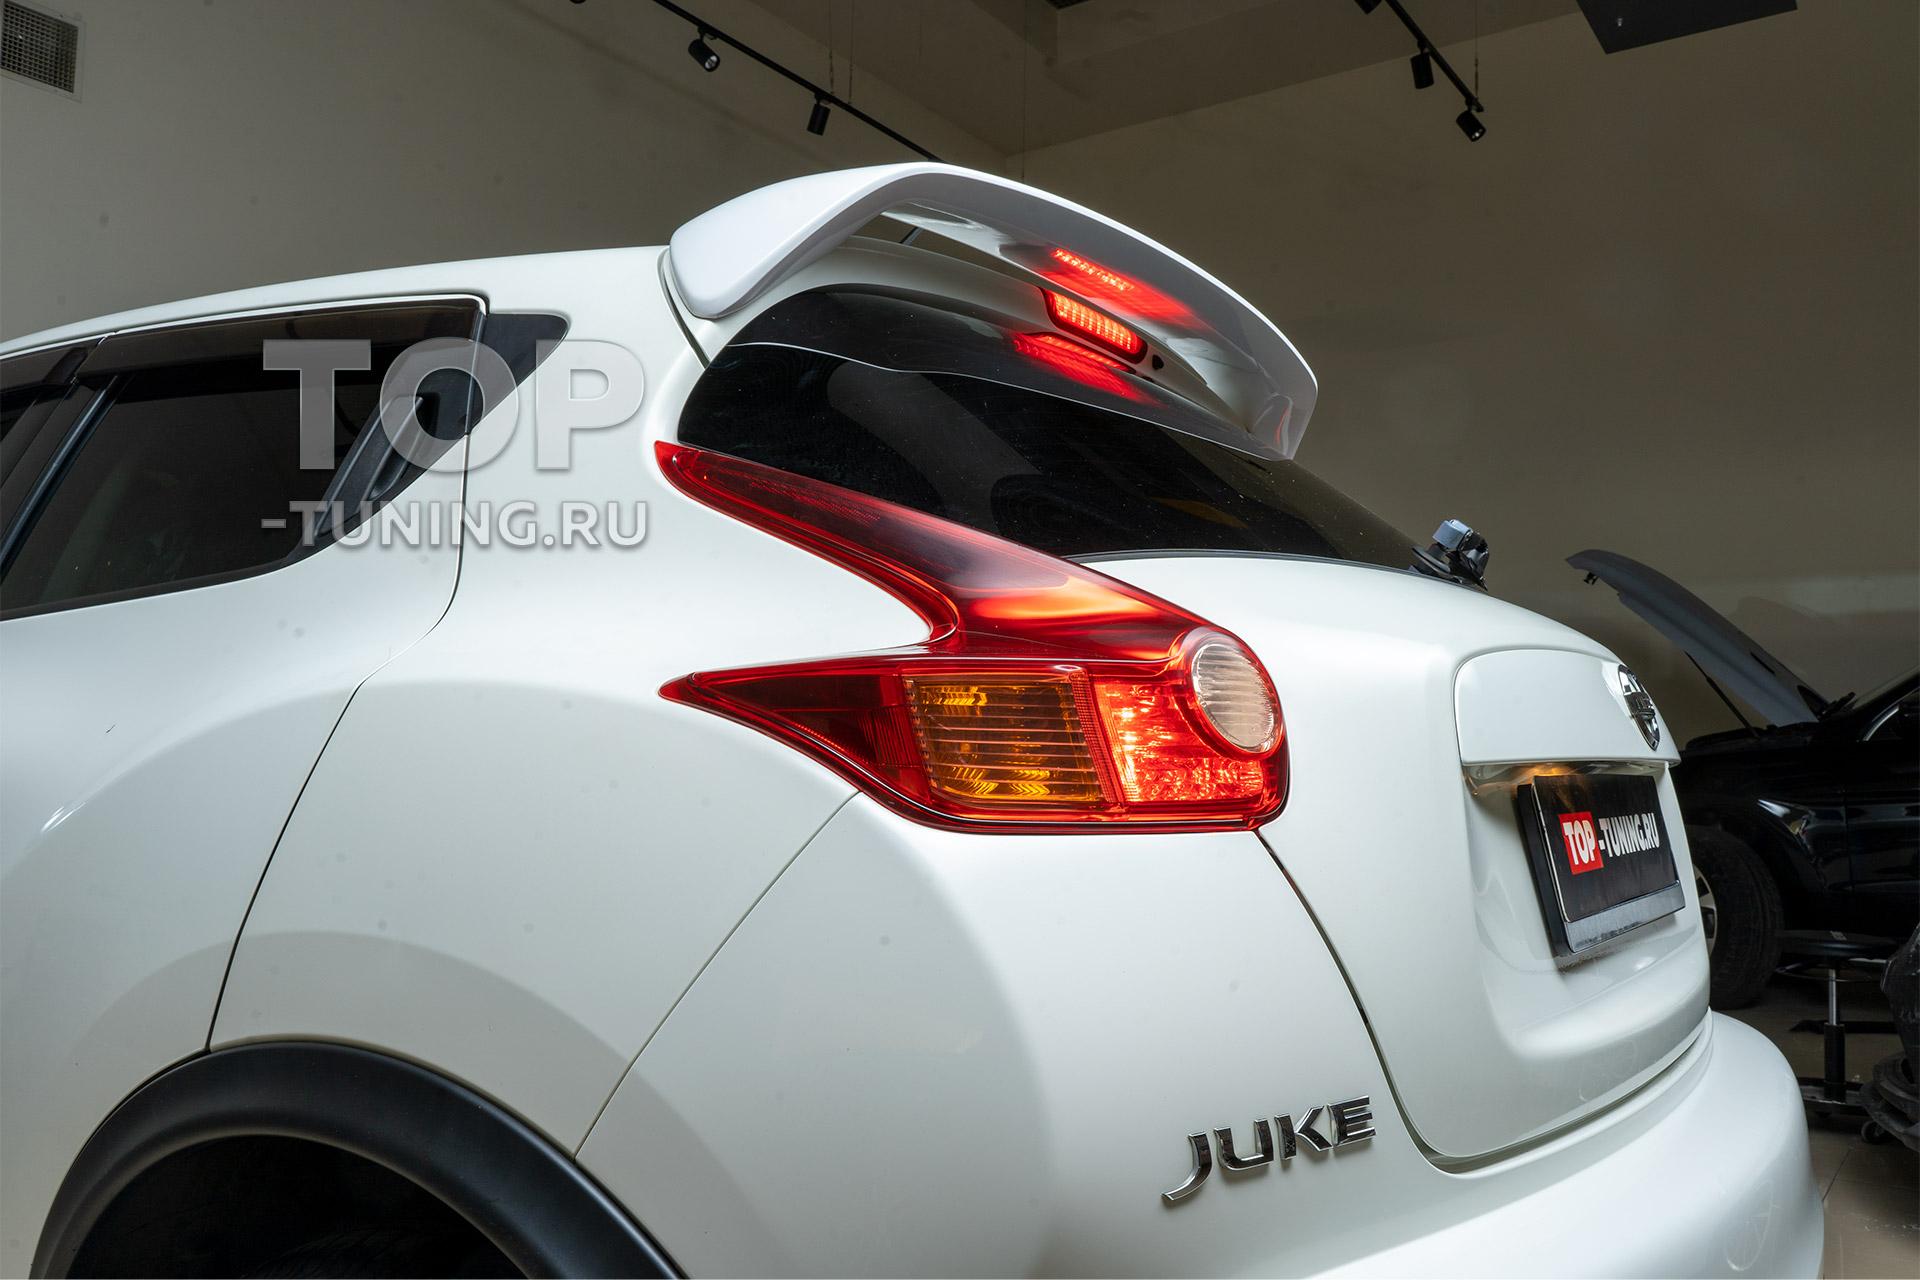 Nissan Juke - установка спойлера на крышку багажника